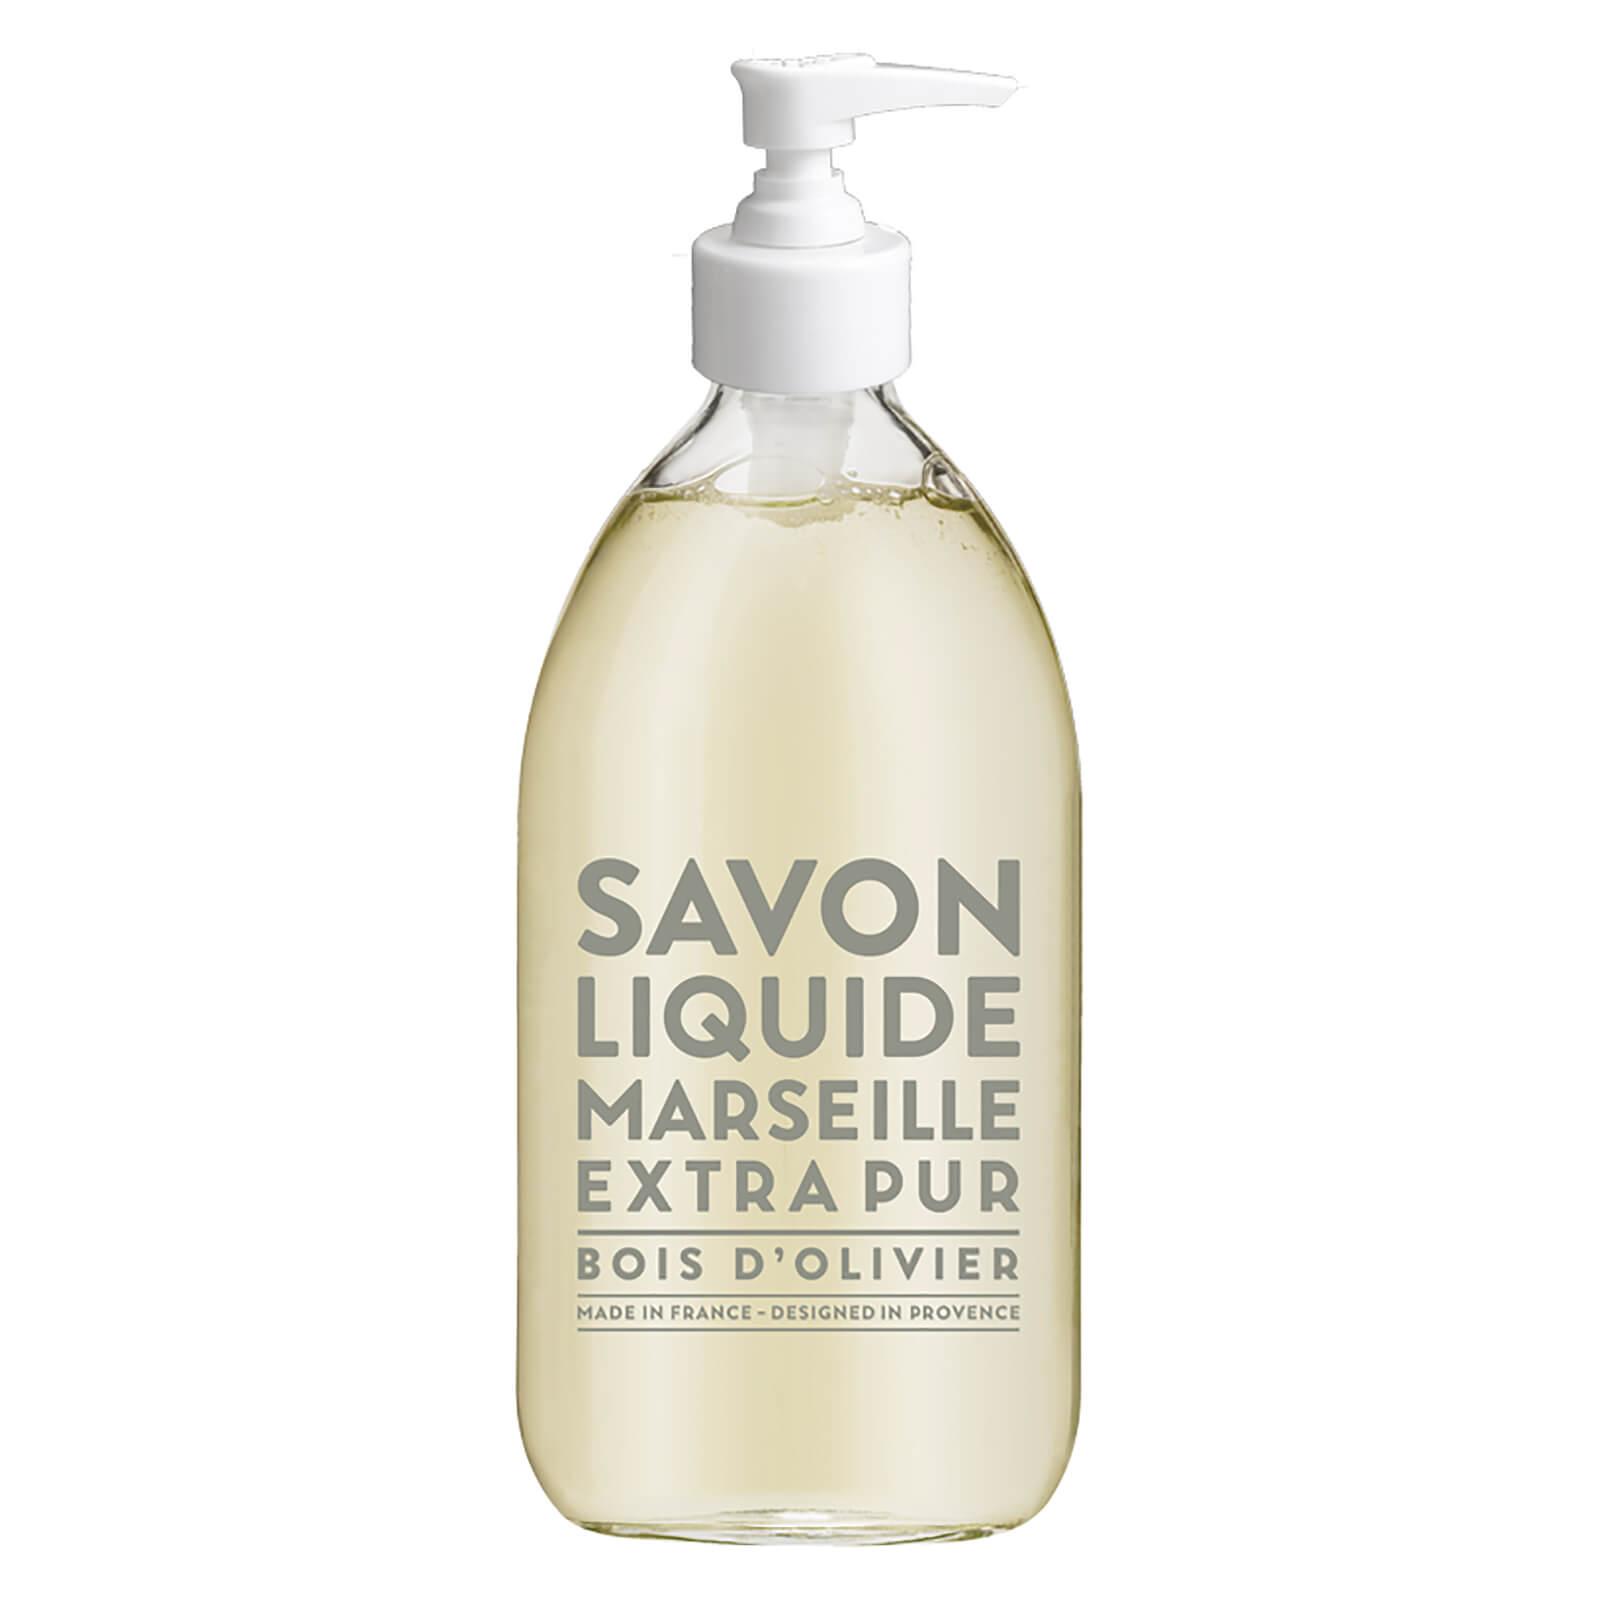 Compagnie de Provence Savon de Marseille Liquide Compagnie de Provence 500ml – Bois d'Olivier